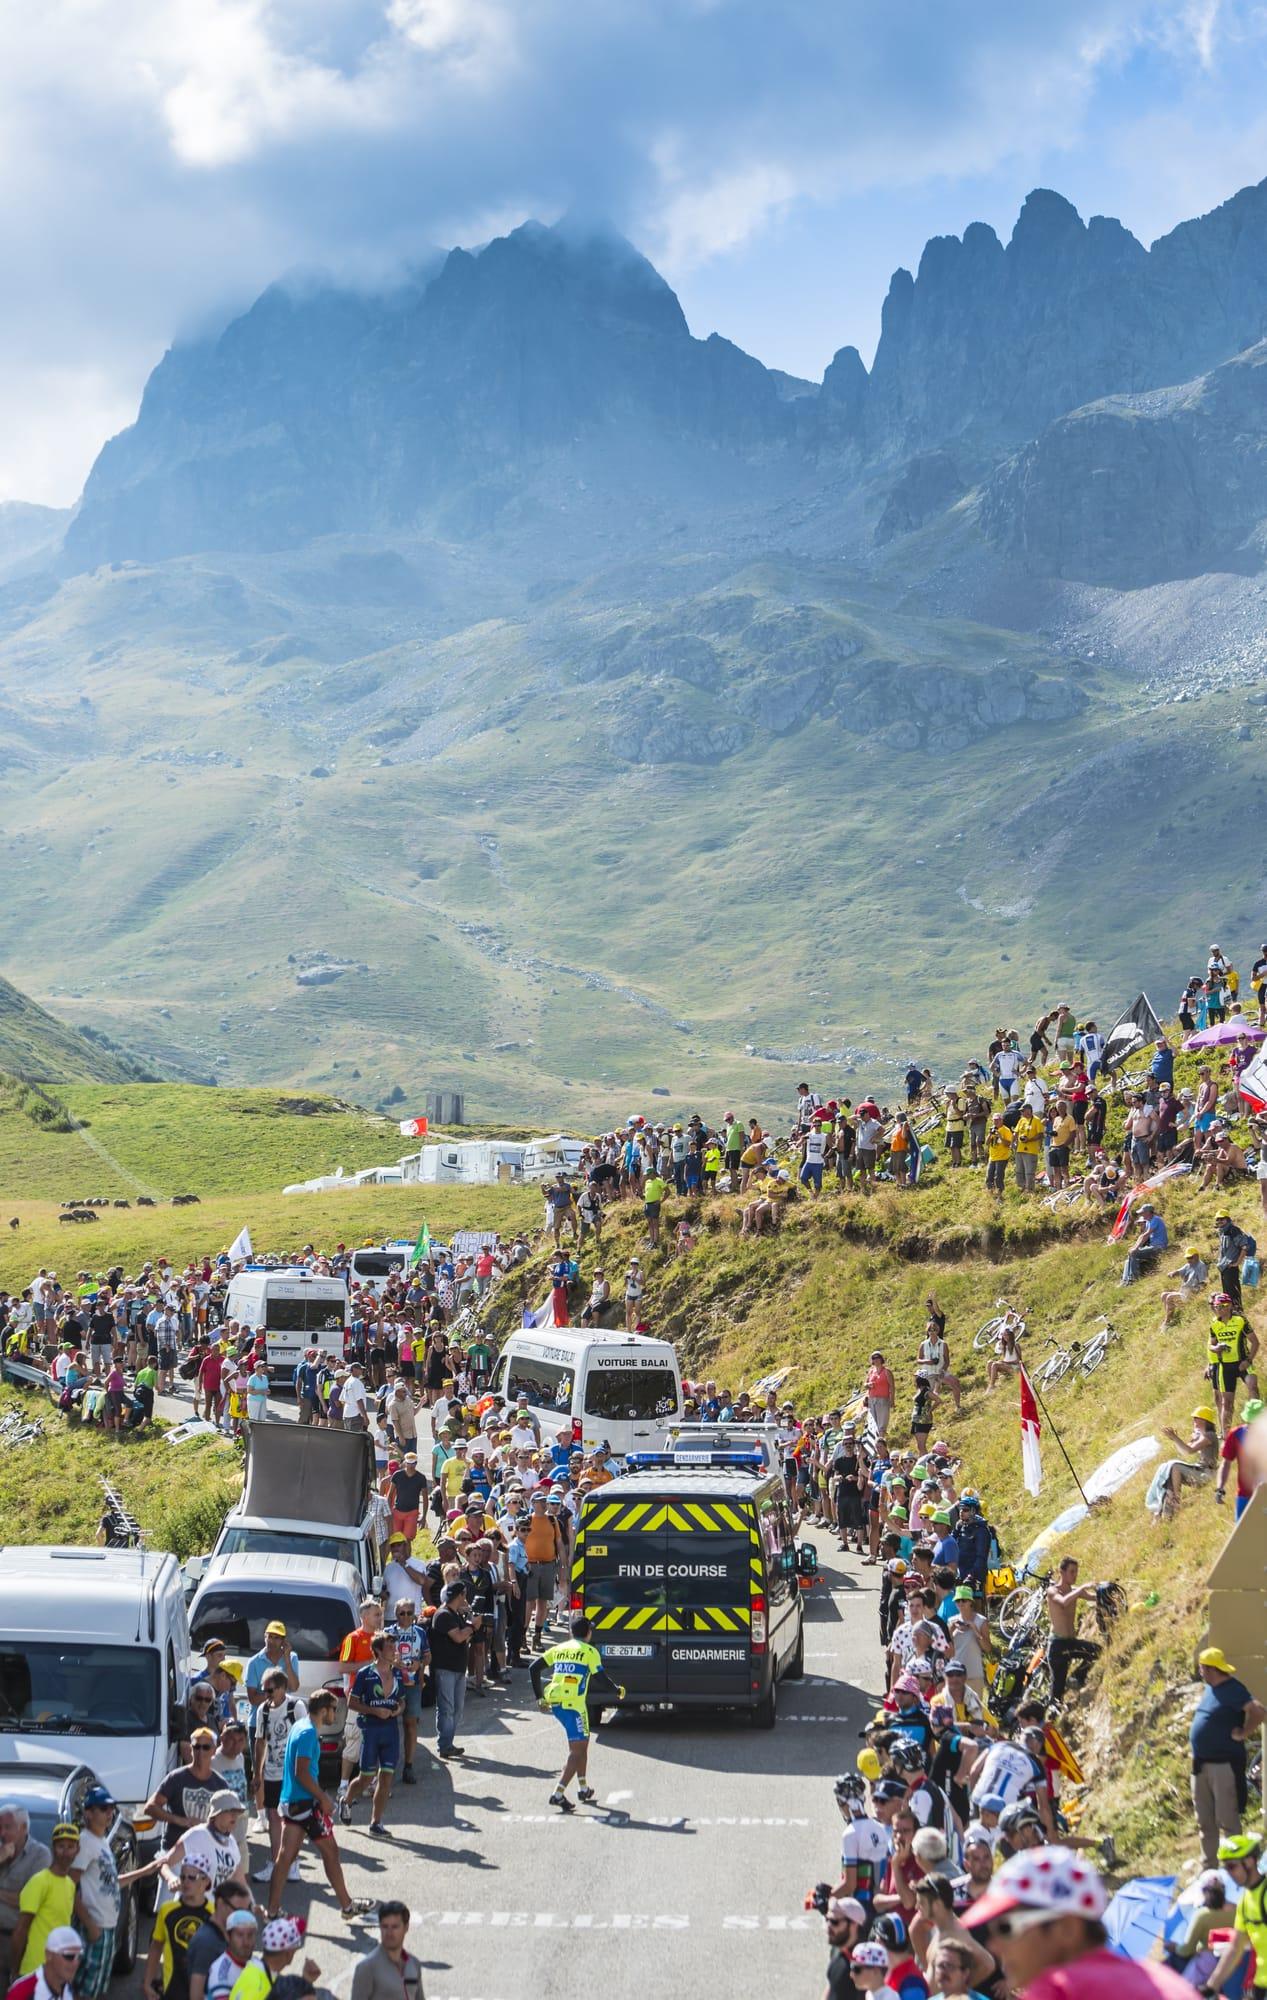 Tour de France: In Alps, Nibali again dominates - Sports